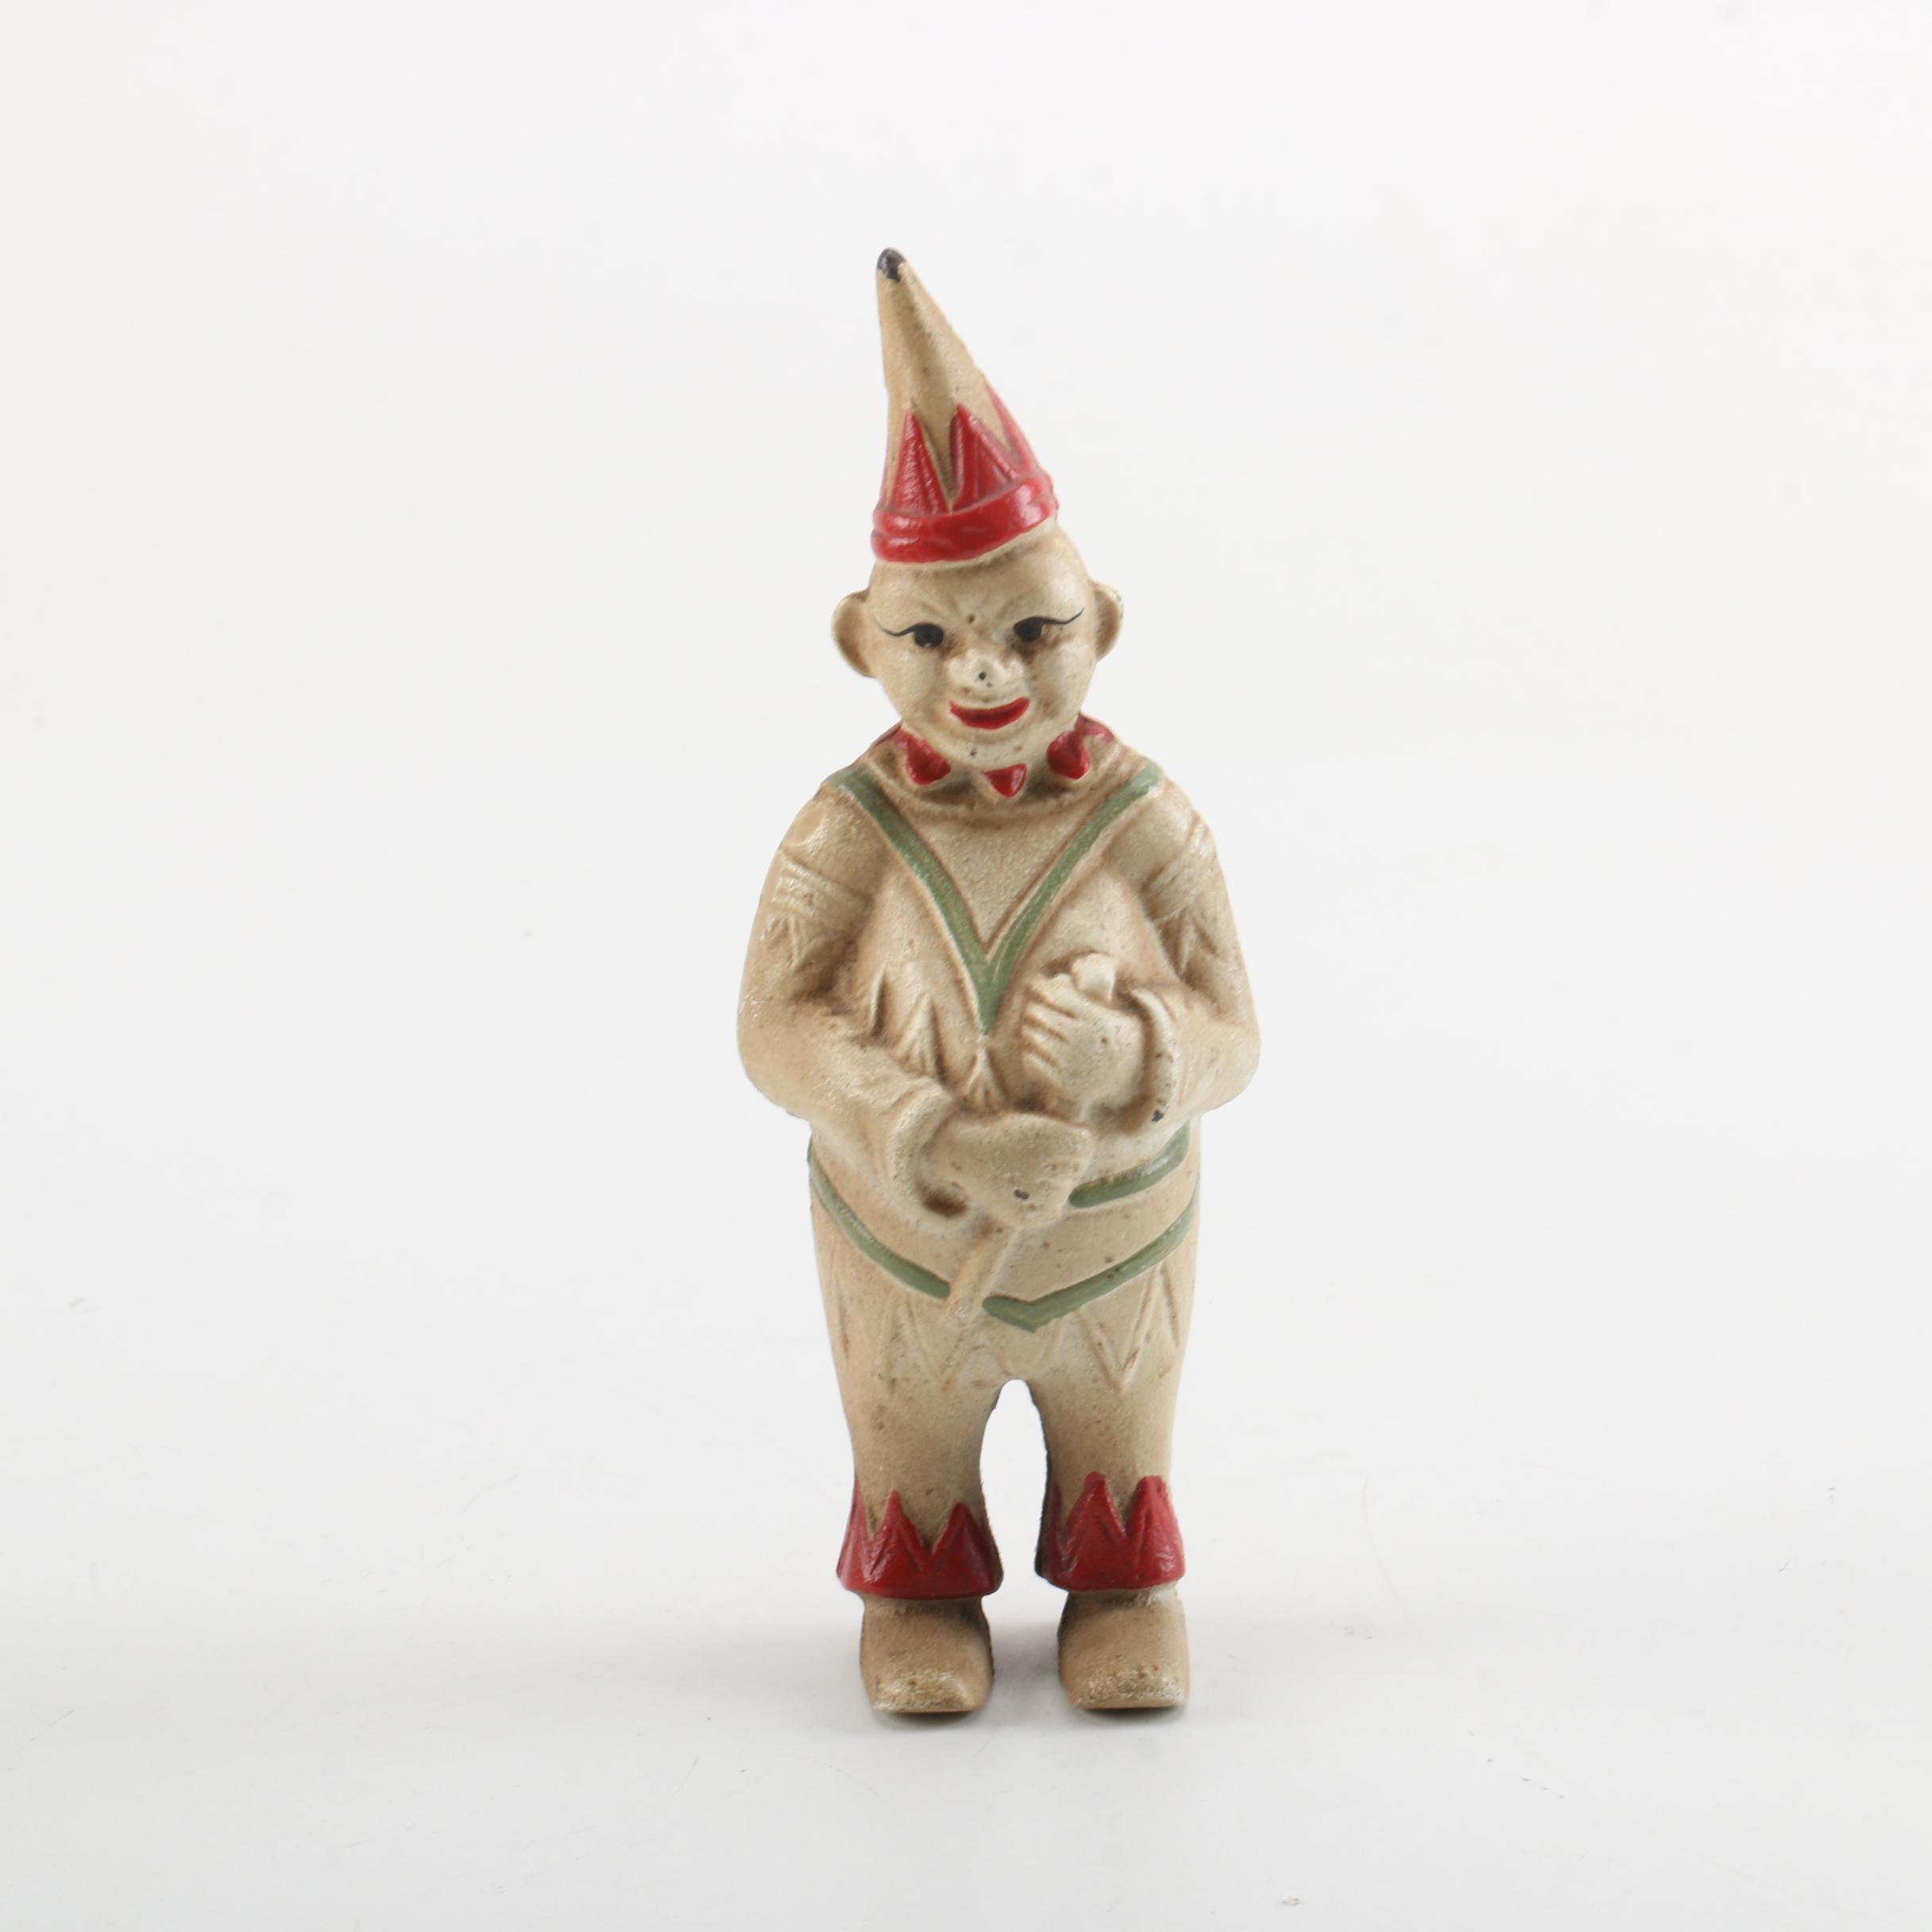 Vintage Clown Bank Figurine